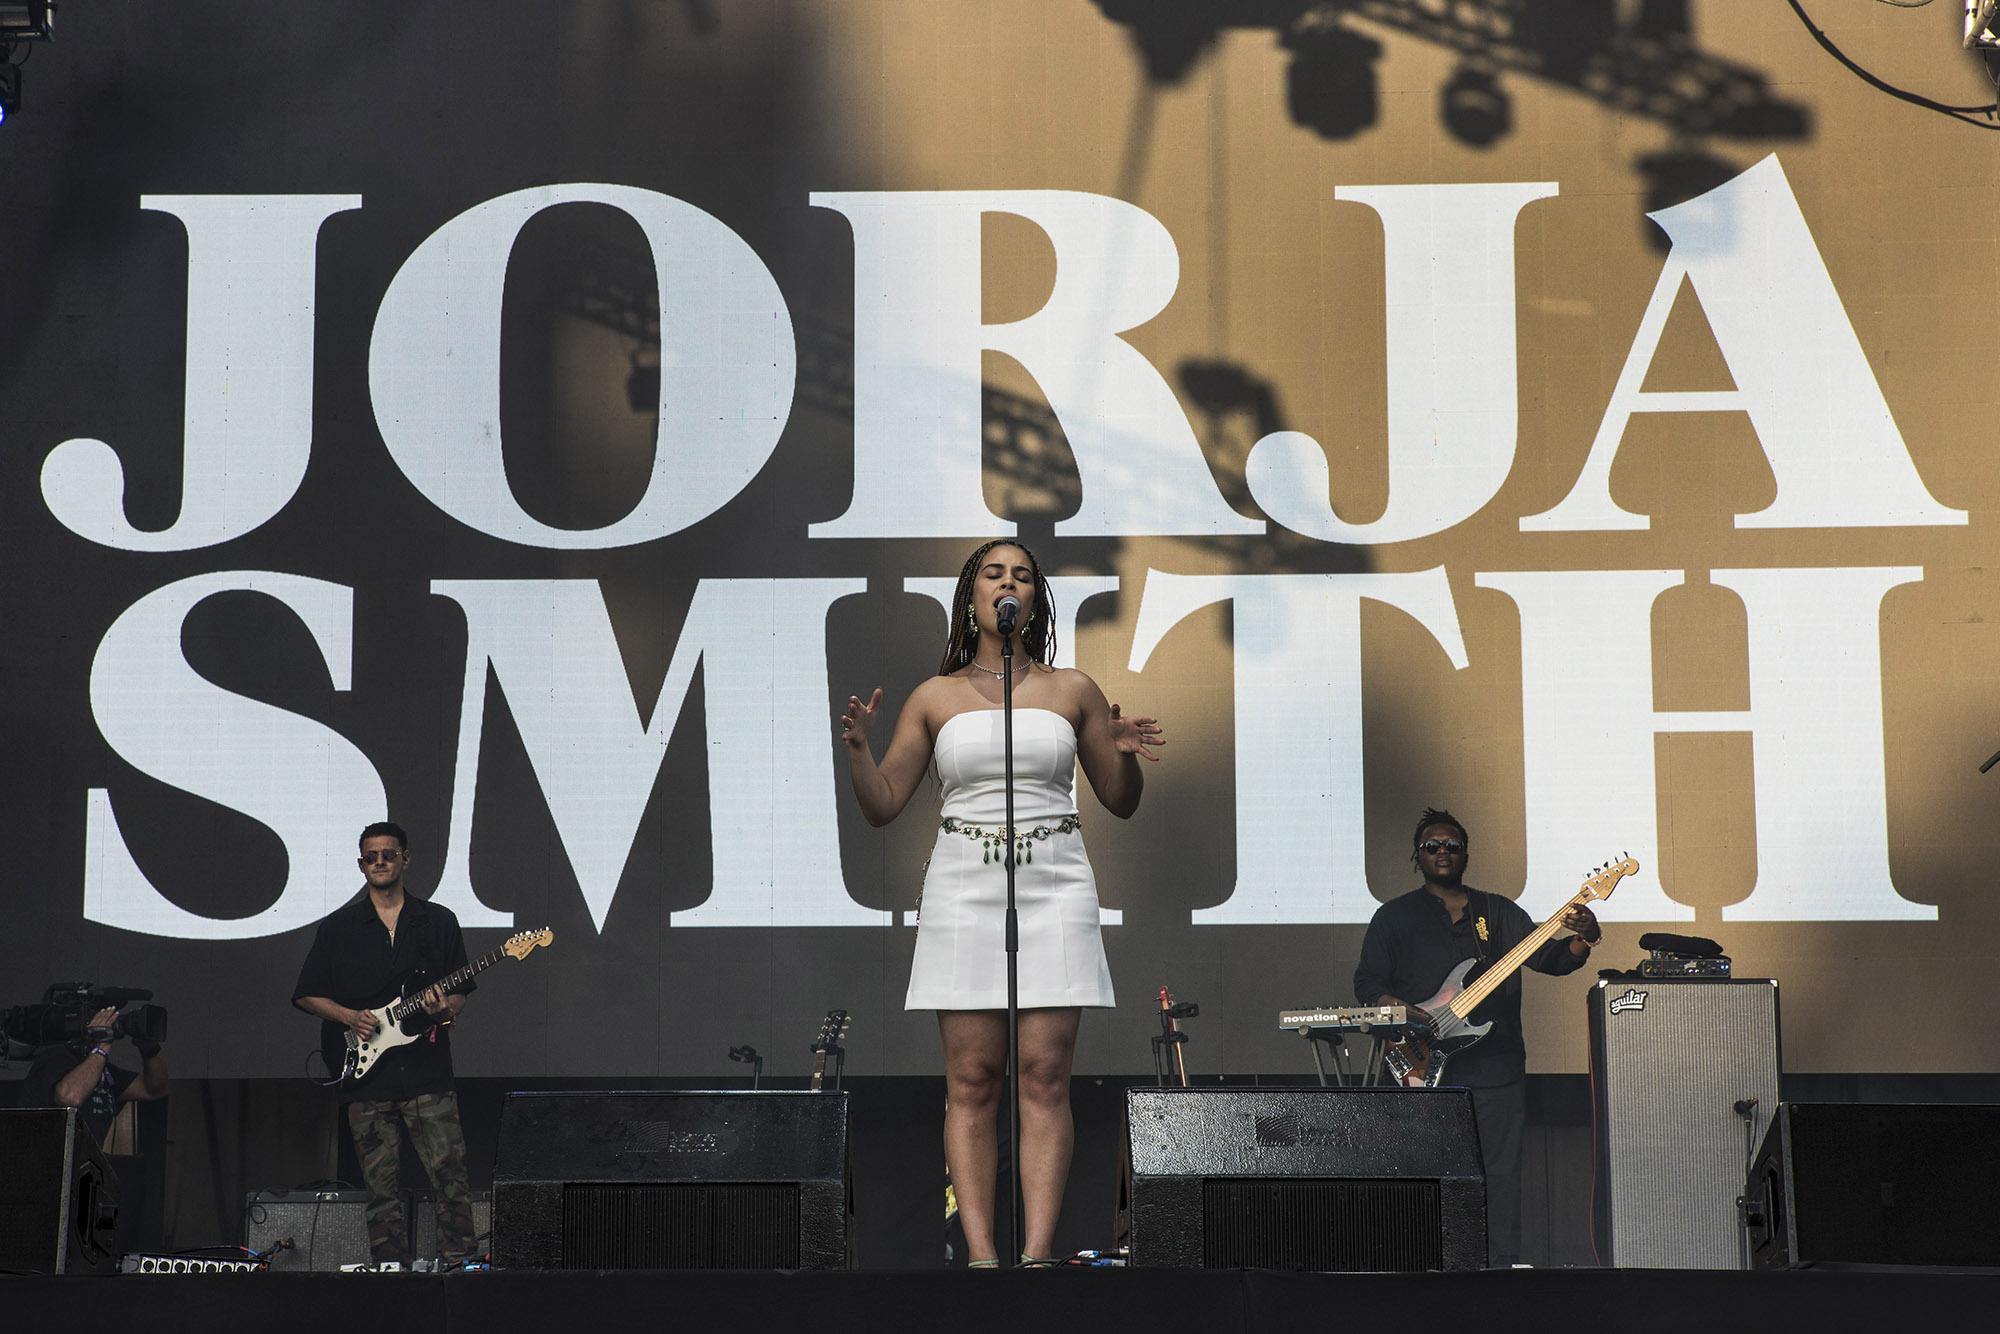 Jorja Smith en Lollapalooza Chile 2019 | Fotógrafo: Gabriel Cedrés